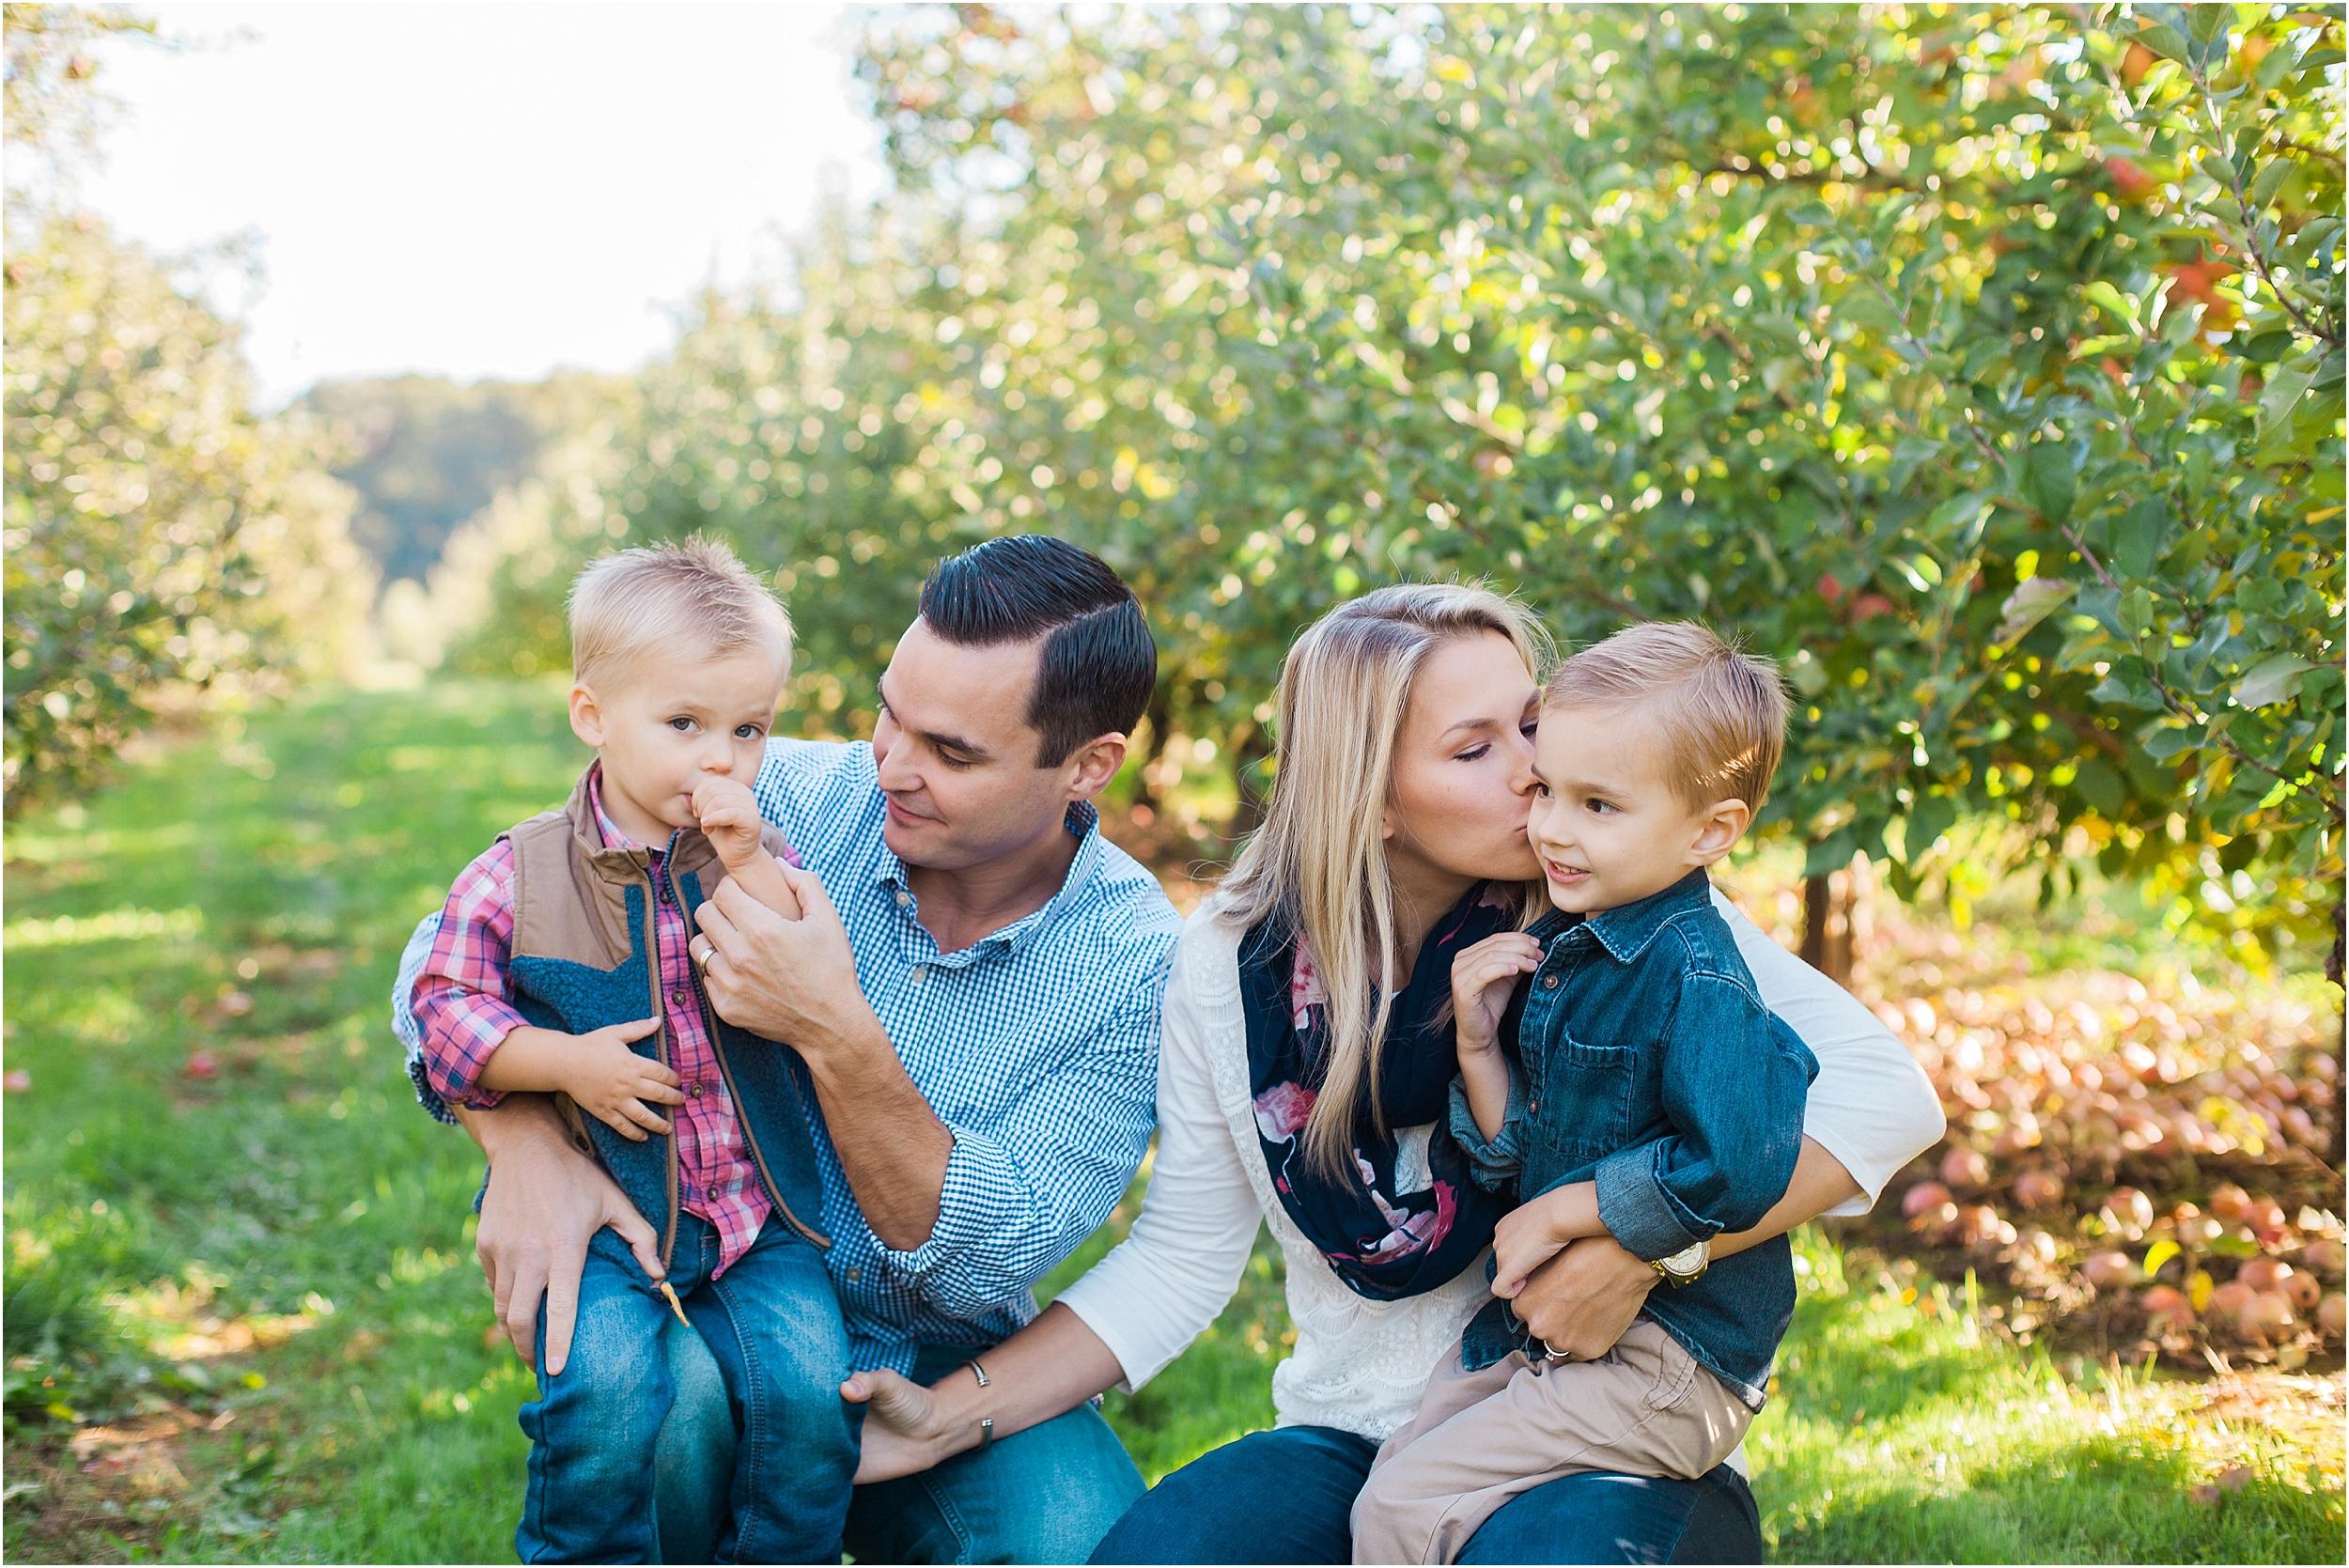 emily grace photography lancaster pa lifestyle family photographer